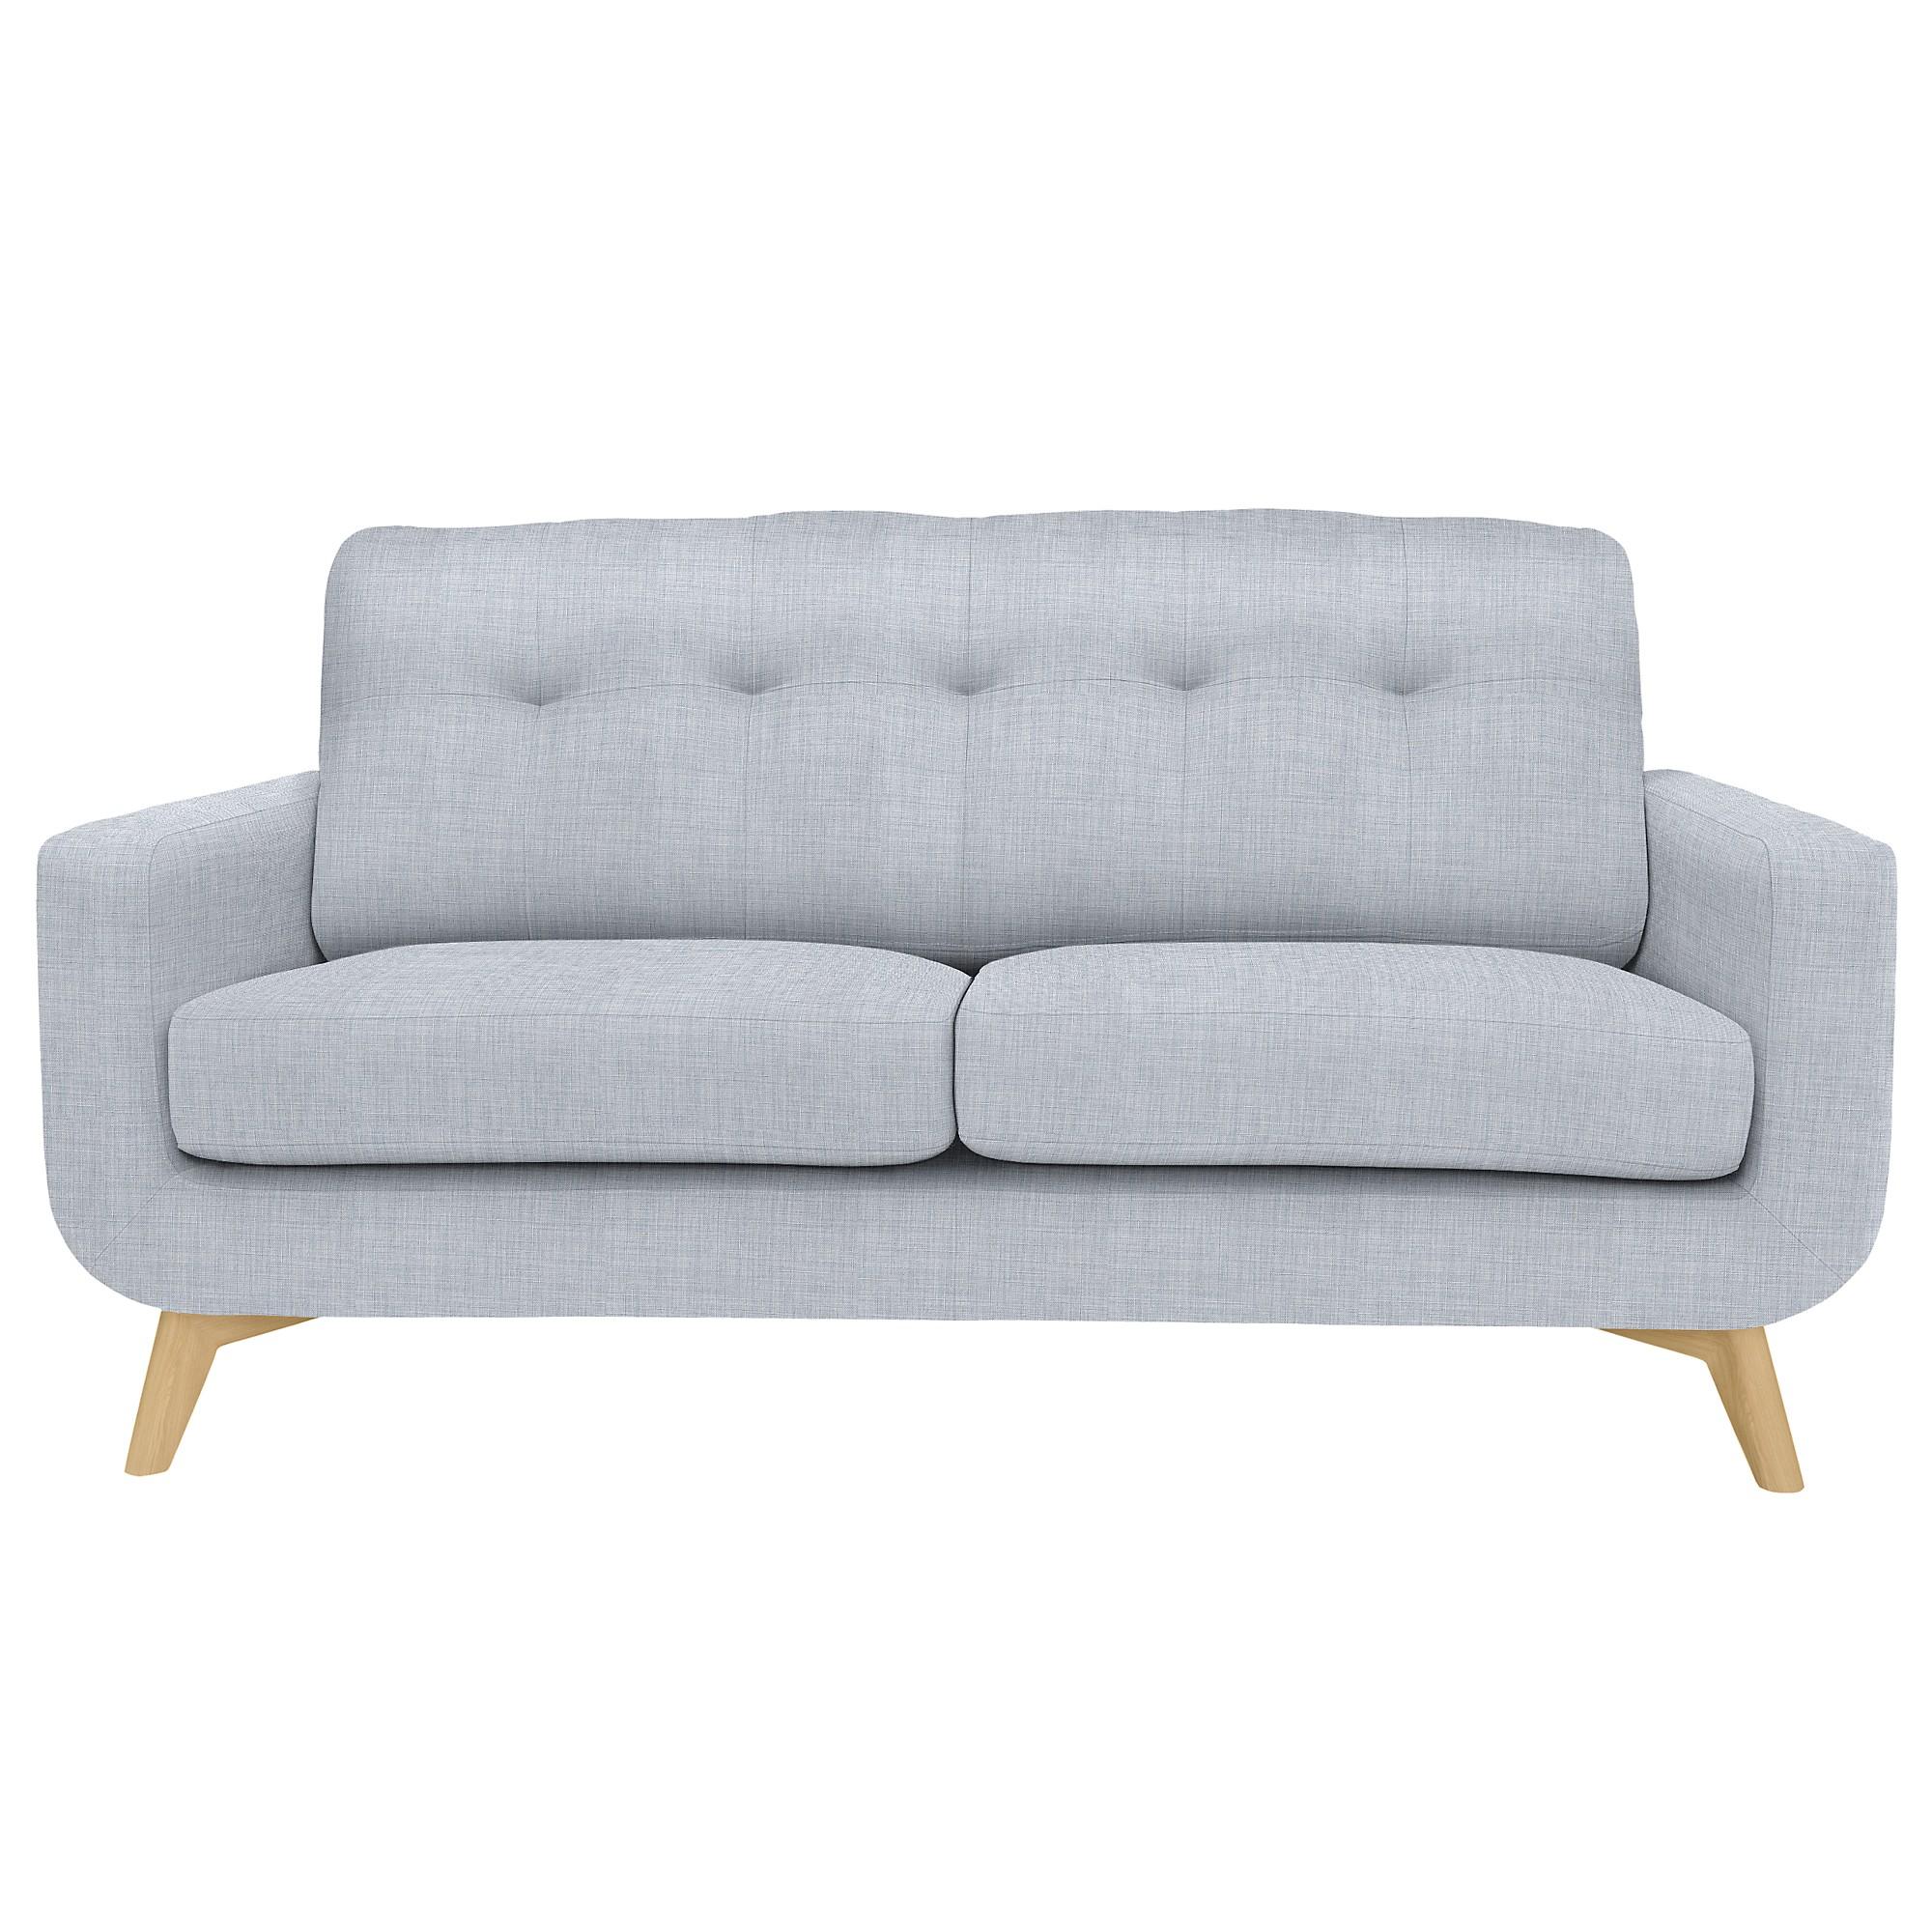 John Lewis Barbican Medium Sofa